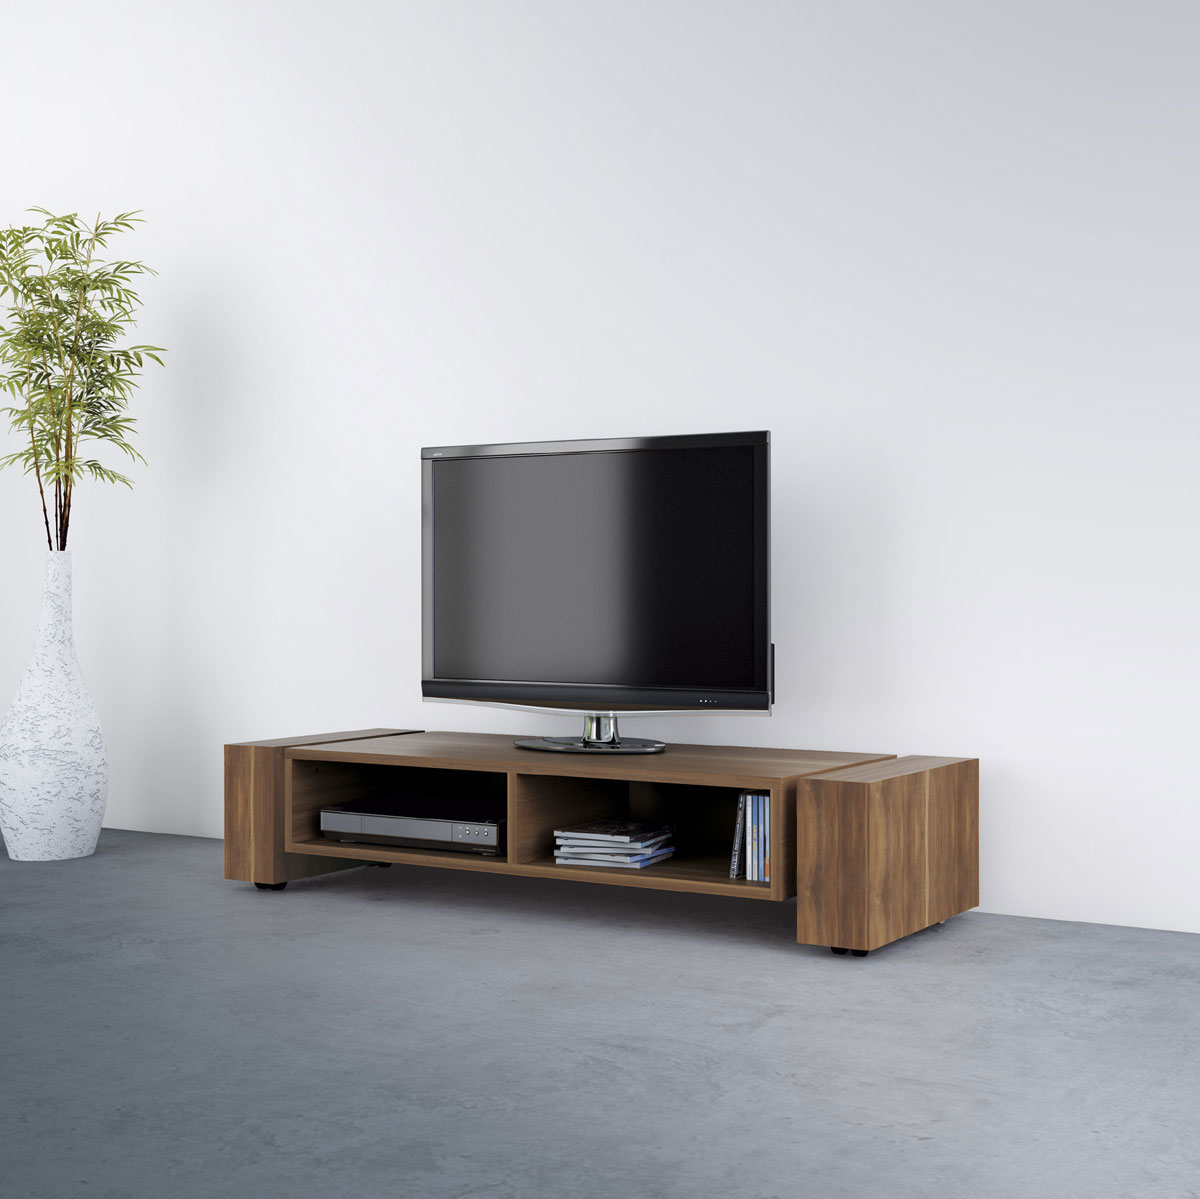 flatscreenhalterung archive tv mobel und hifi mobel guide